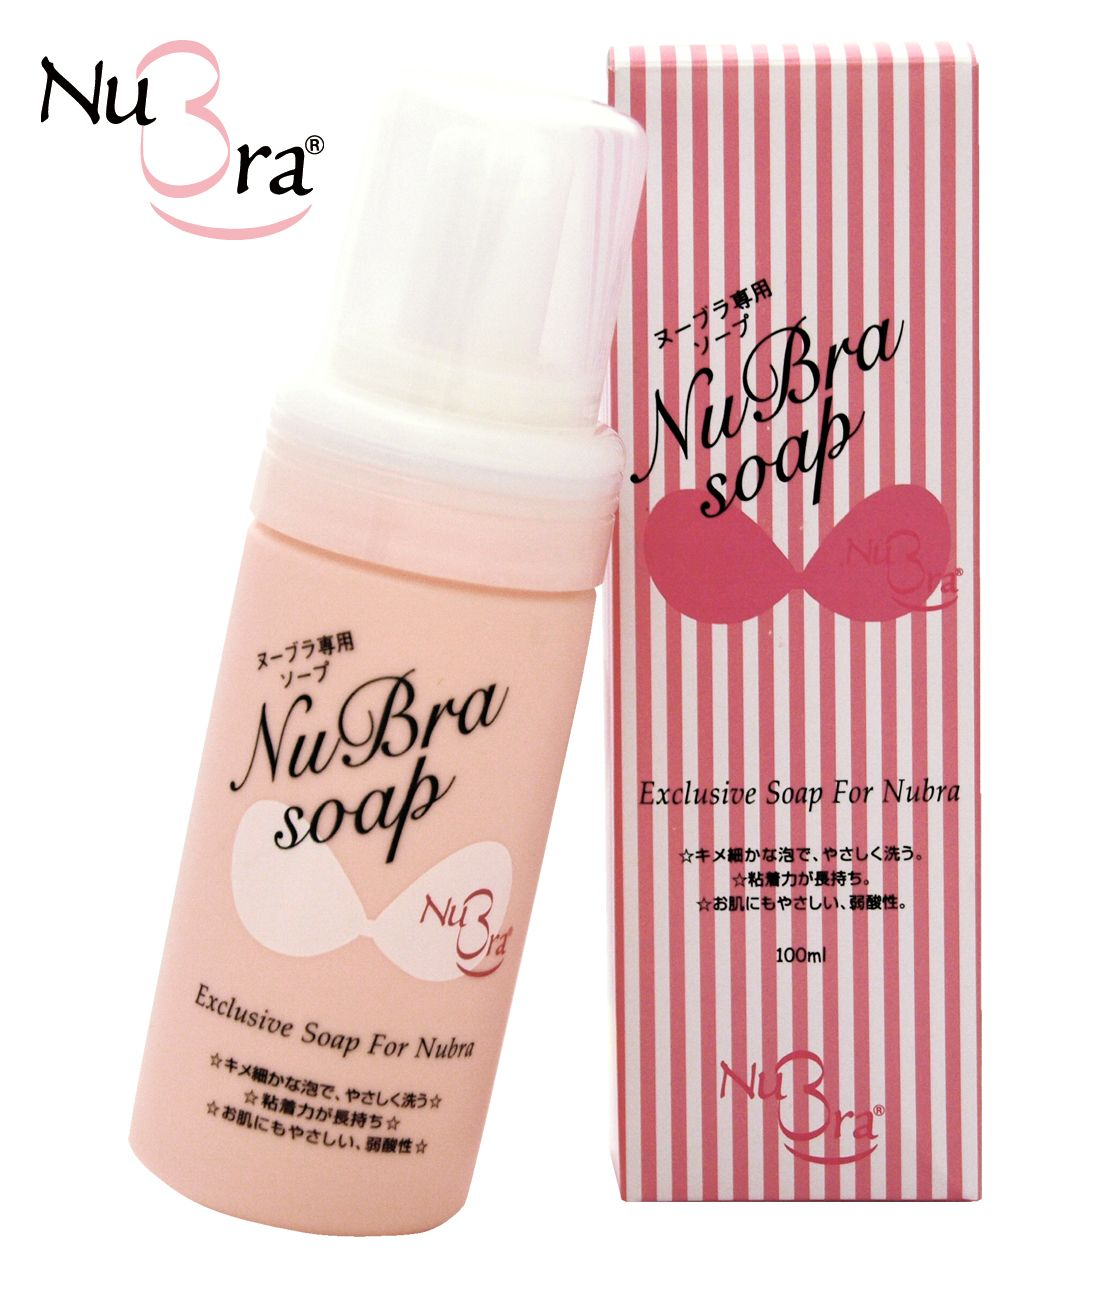 Nubra soap